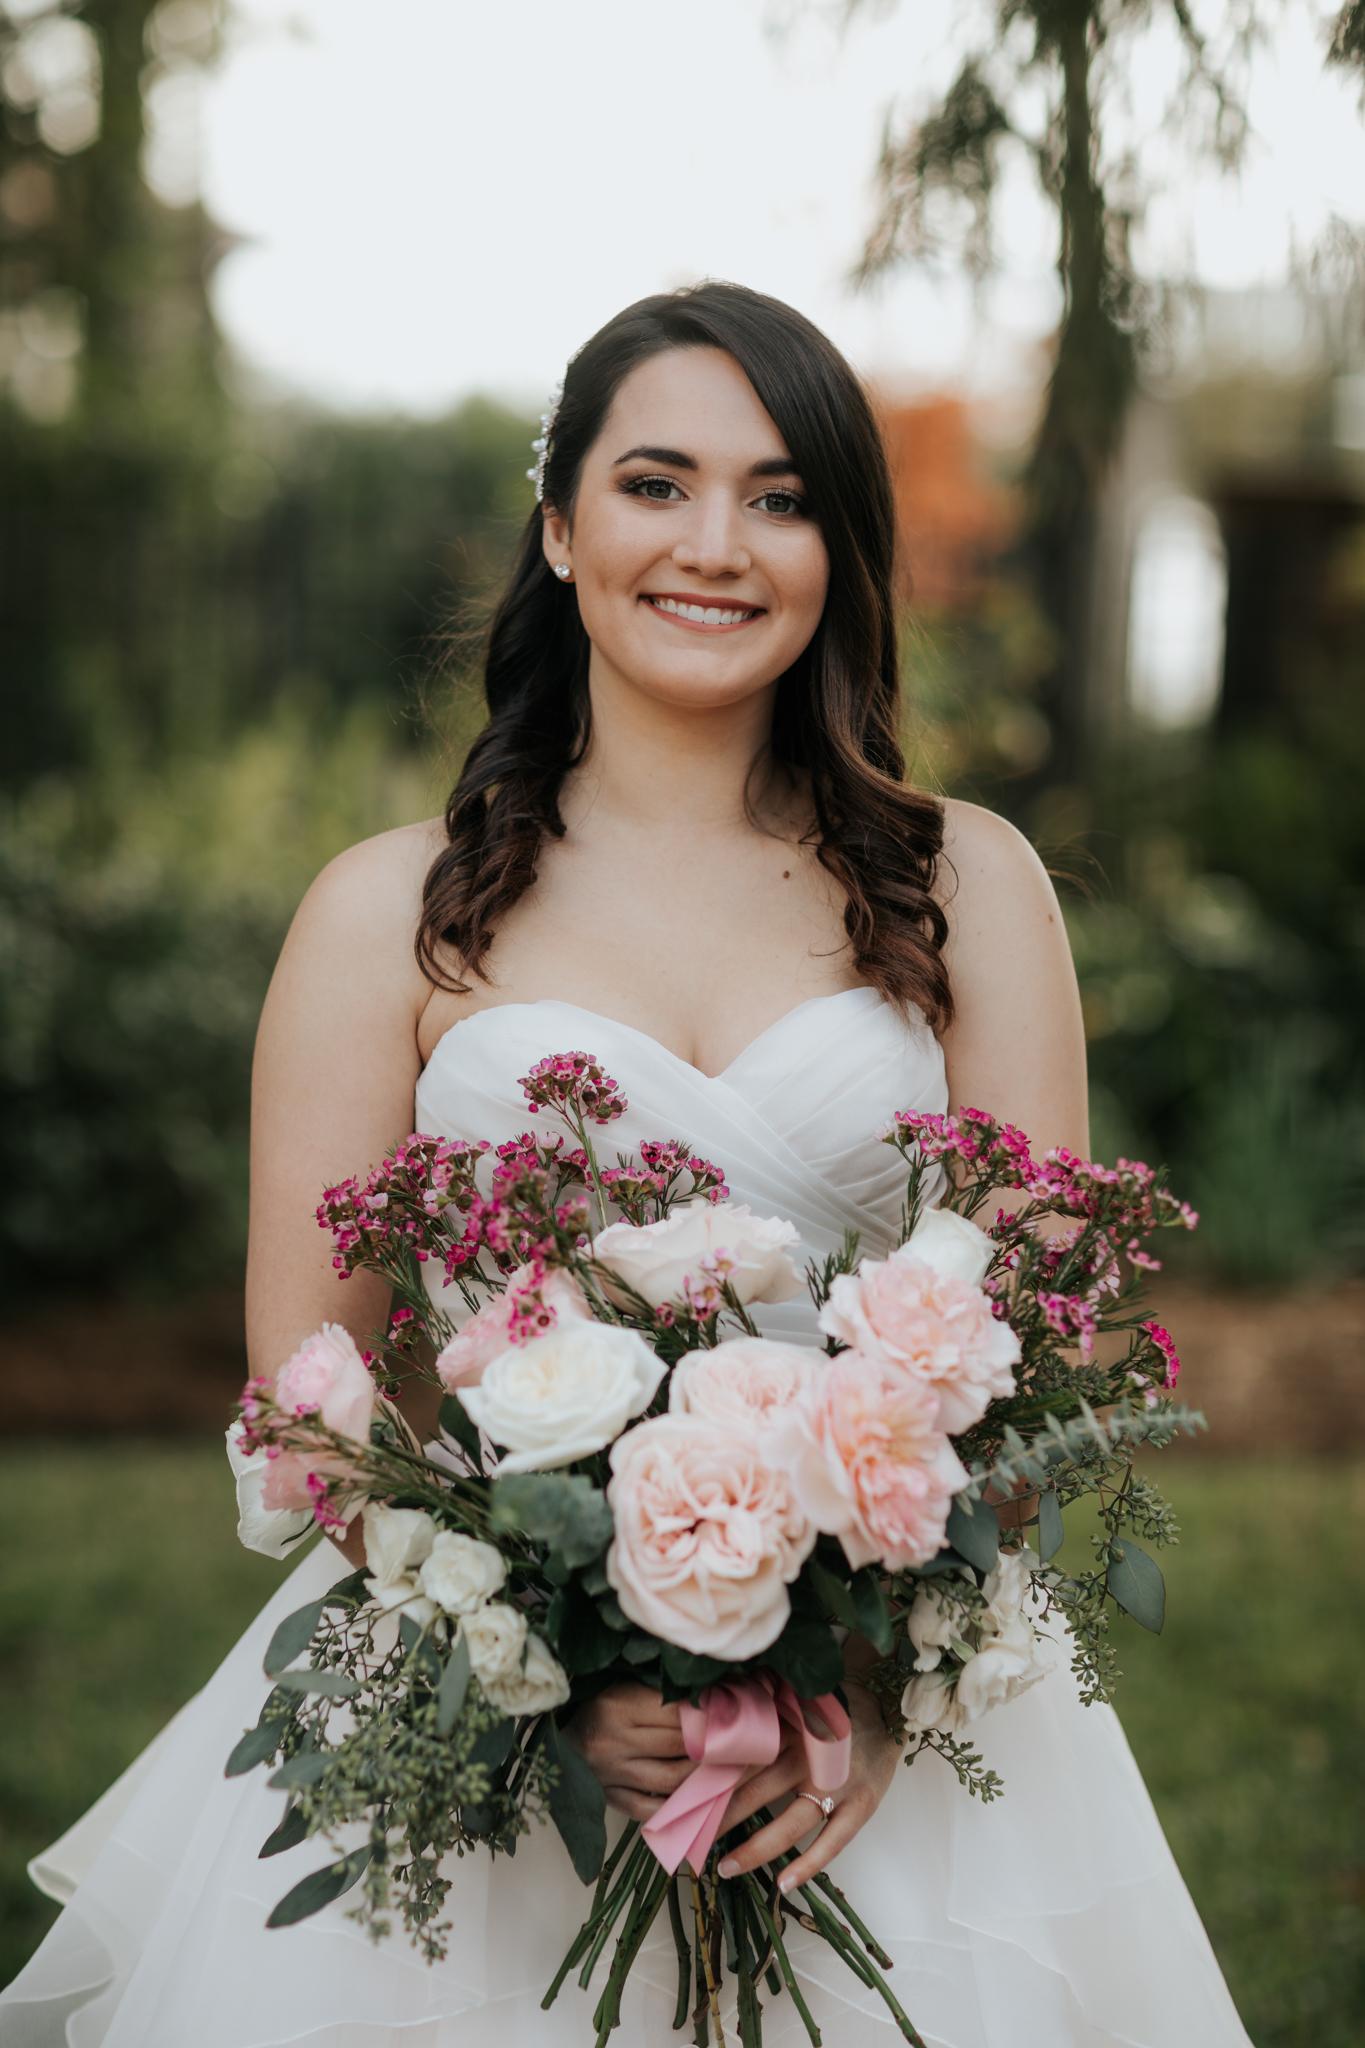 Leah Nicole Photography - Houston Wedding Photographer-Lake Conroe Wedding- Houston Wedding Photographer-15.jpg